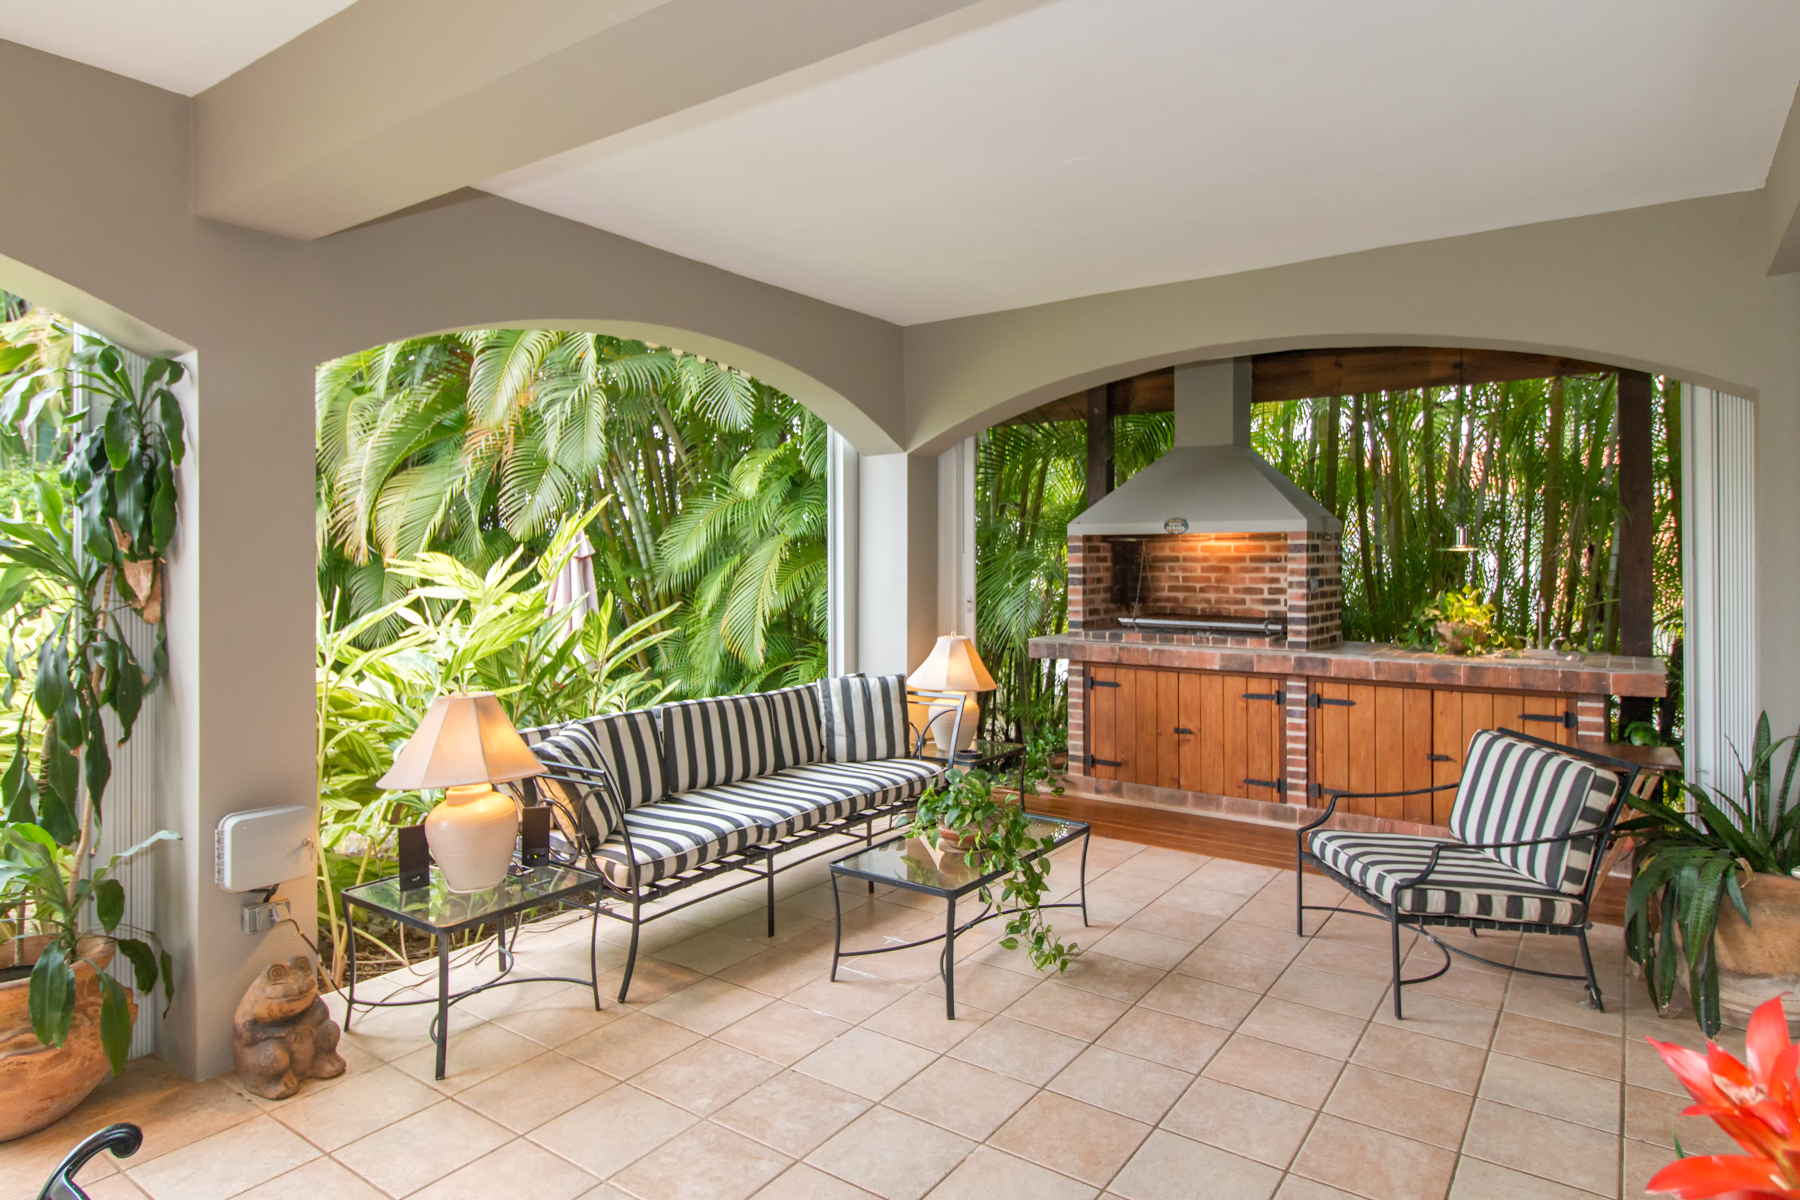 Single Family Home for Sale at Scenic Montehiedra Home 284 Calle Jilguero San Juan, Puerto Rico 00926 Puerto Rico